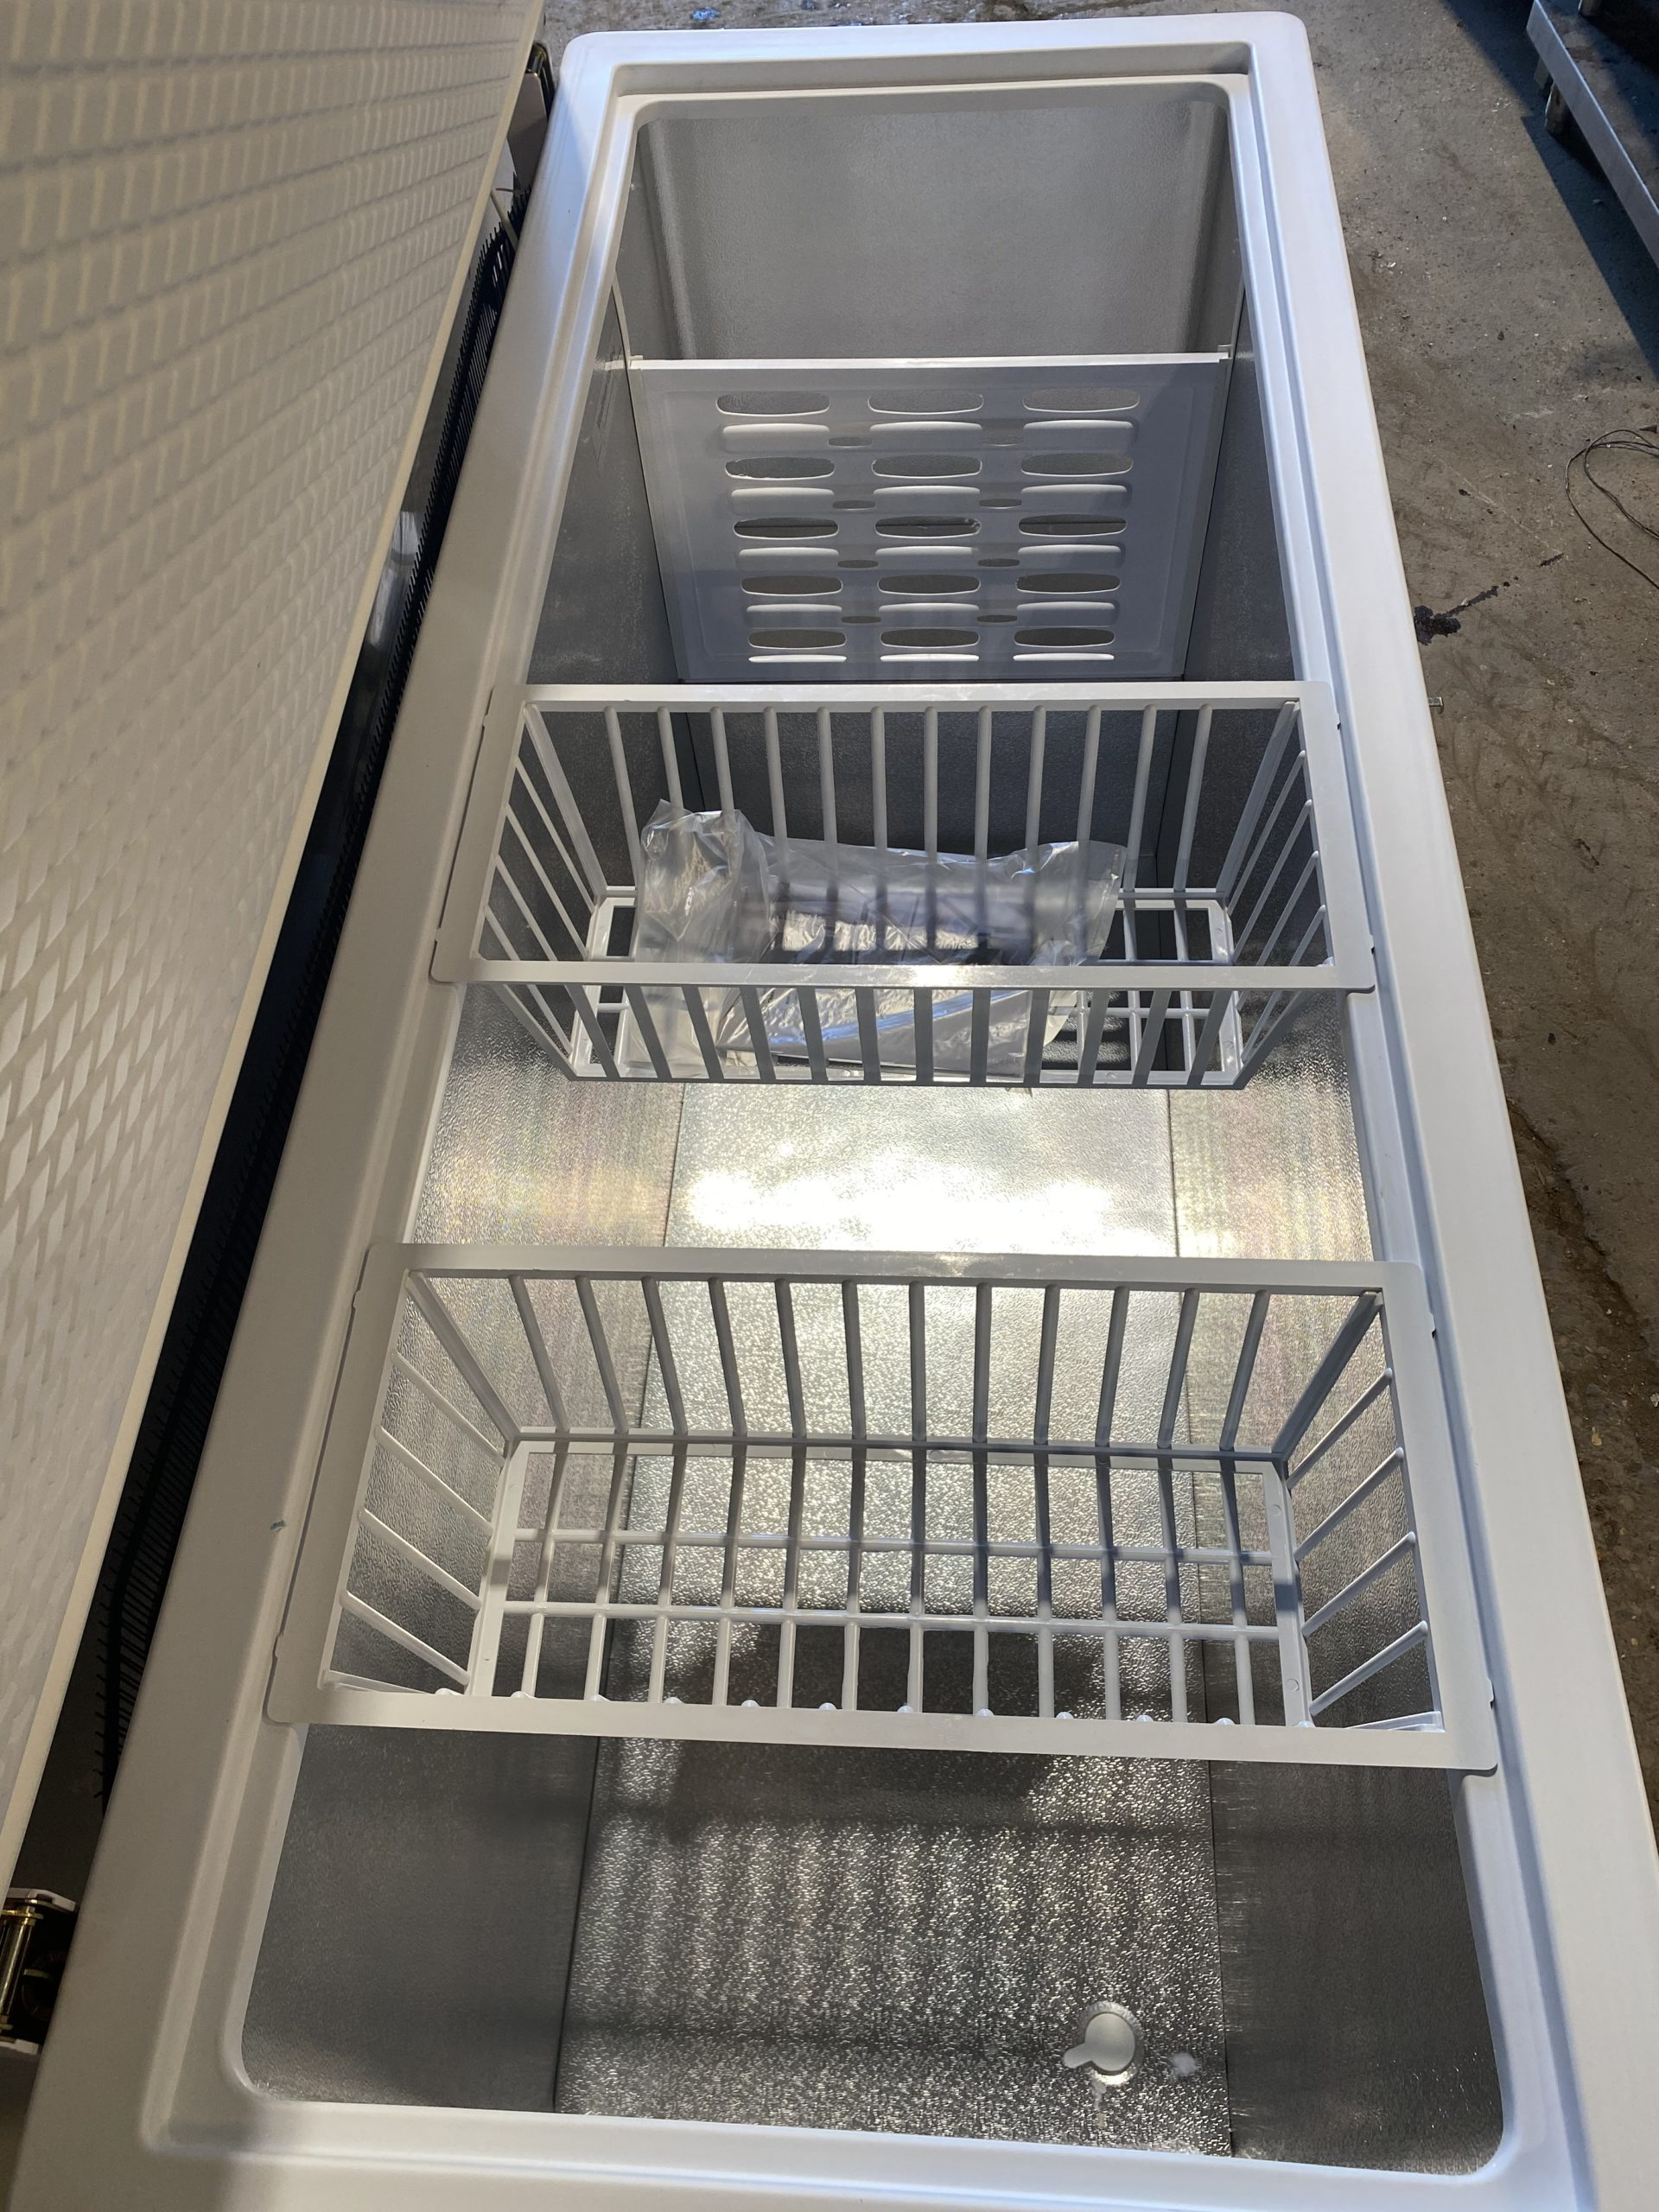 KAZ Commercial Chest Freezer – Brand New!